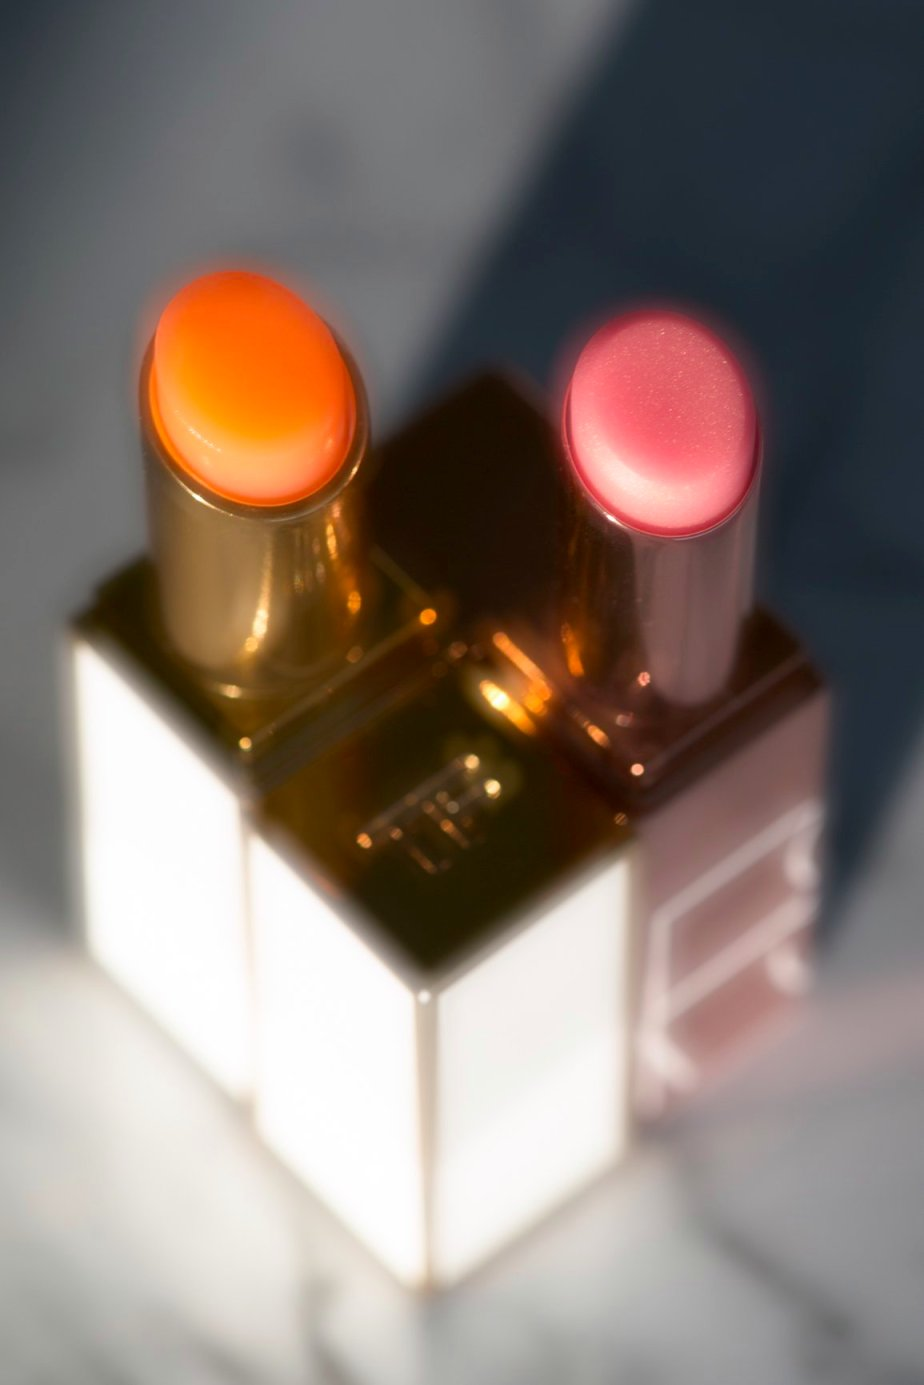 sunkissedblush-Tom-Ford-Lumière-Lip-Orgasm-Afterglow-Lip-Balm (1 of 1)